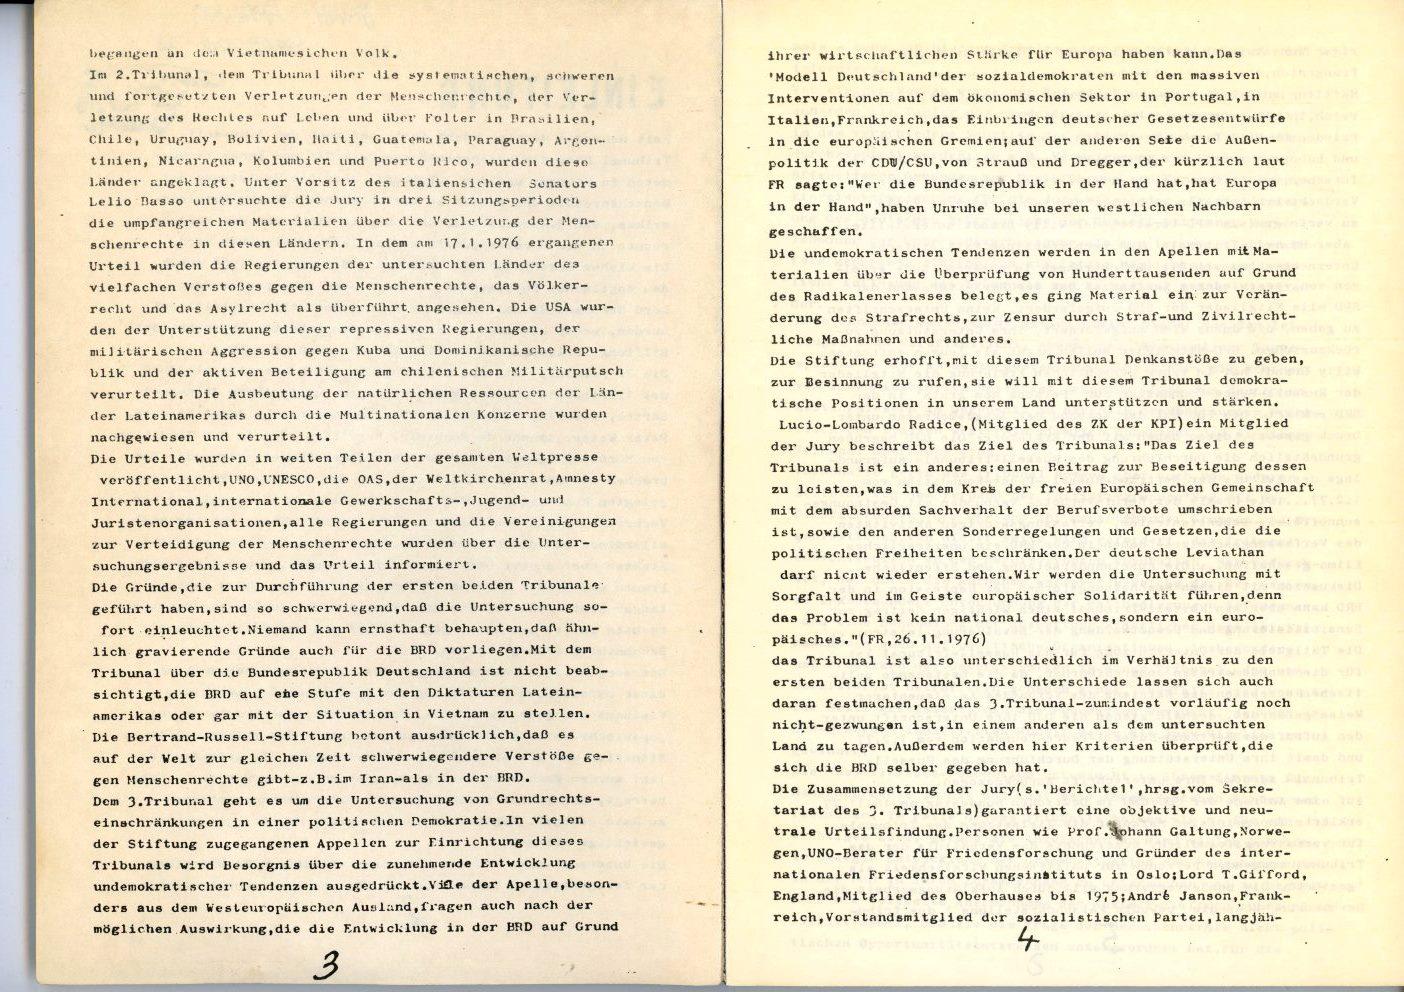 Marburg_Russell_Initiative_1978_03